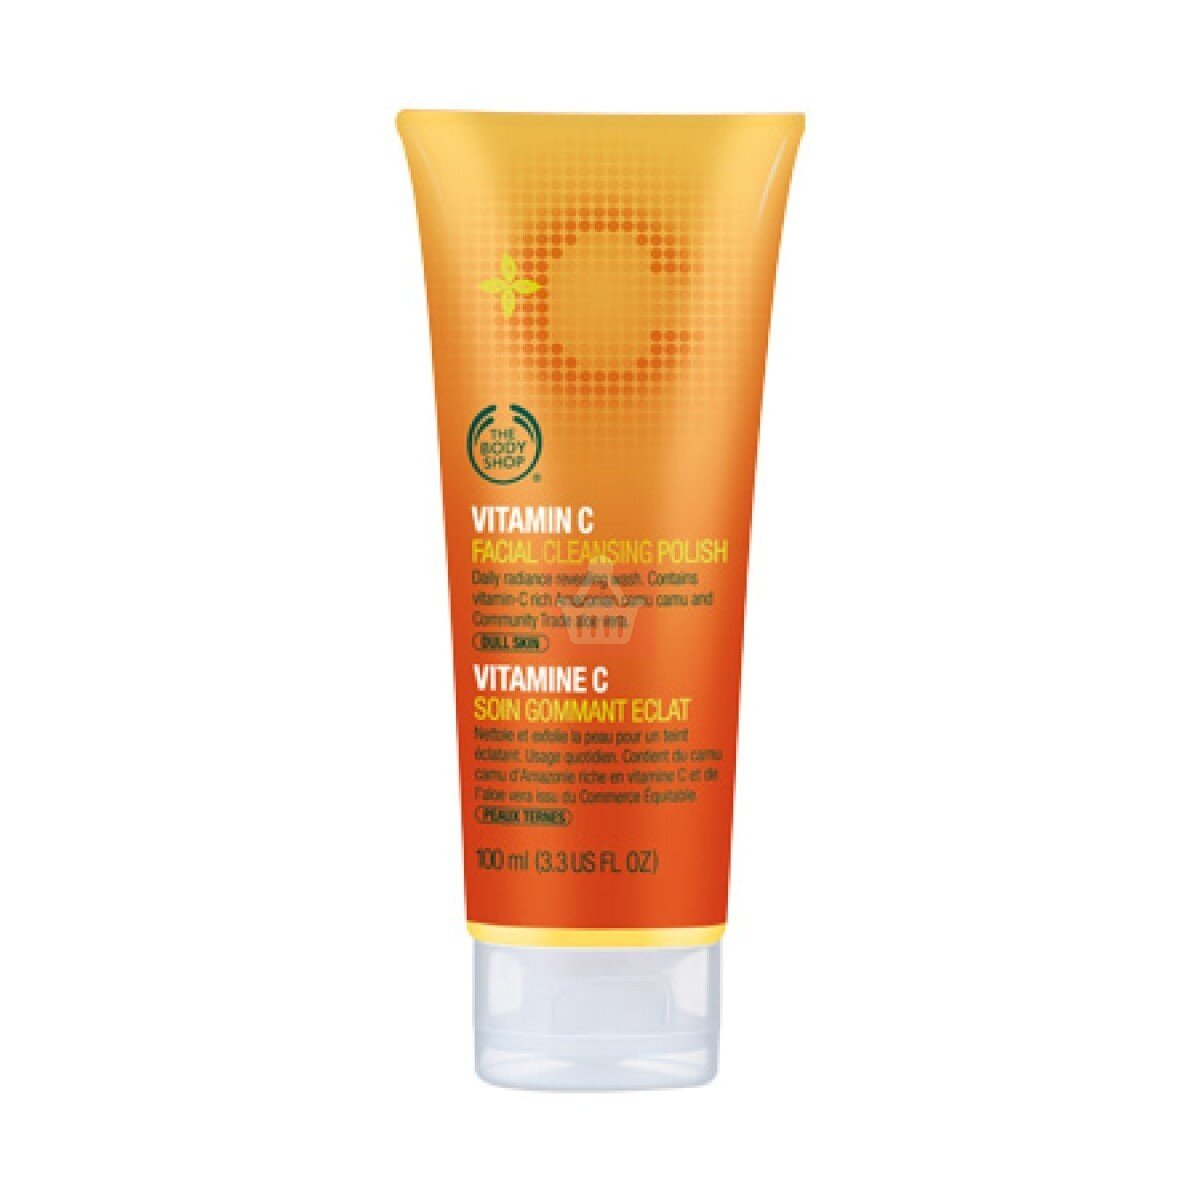 Sữa rửa mặt The Body Shop Vitamin C Facial Cleansing Polish 125ml